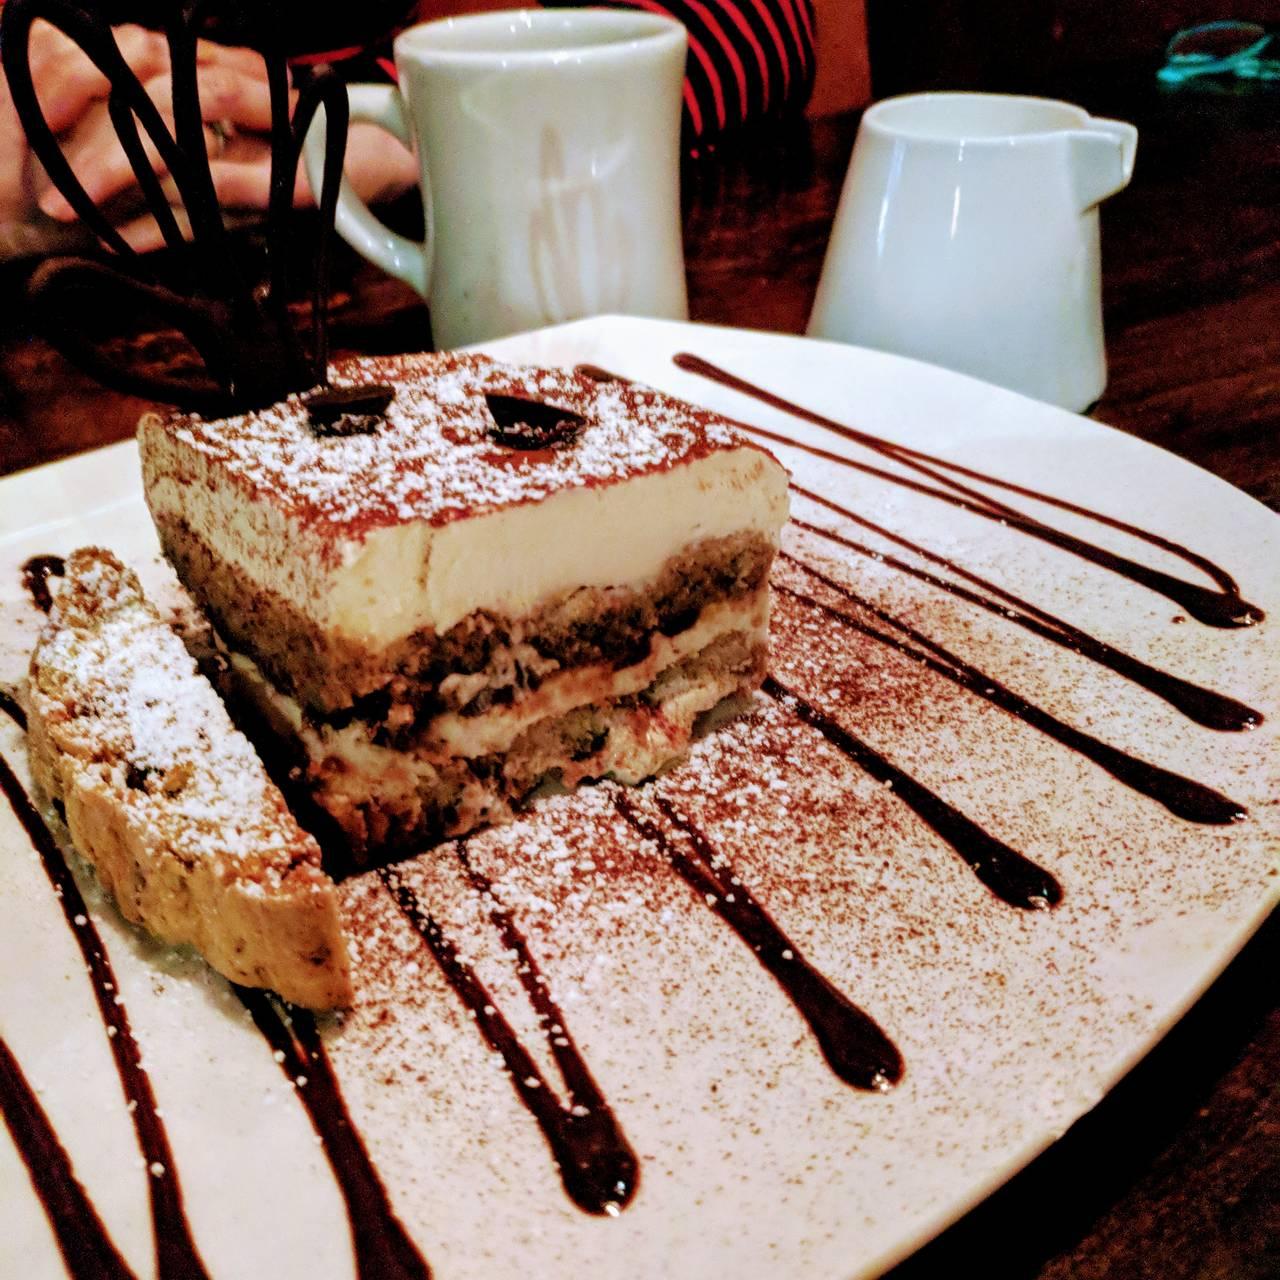 Cafe Fiore Dessert Menu